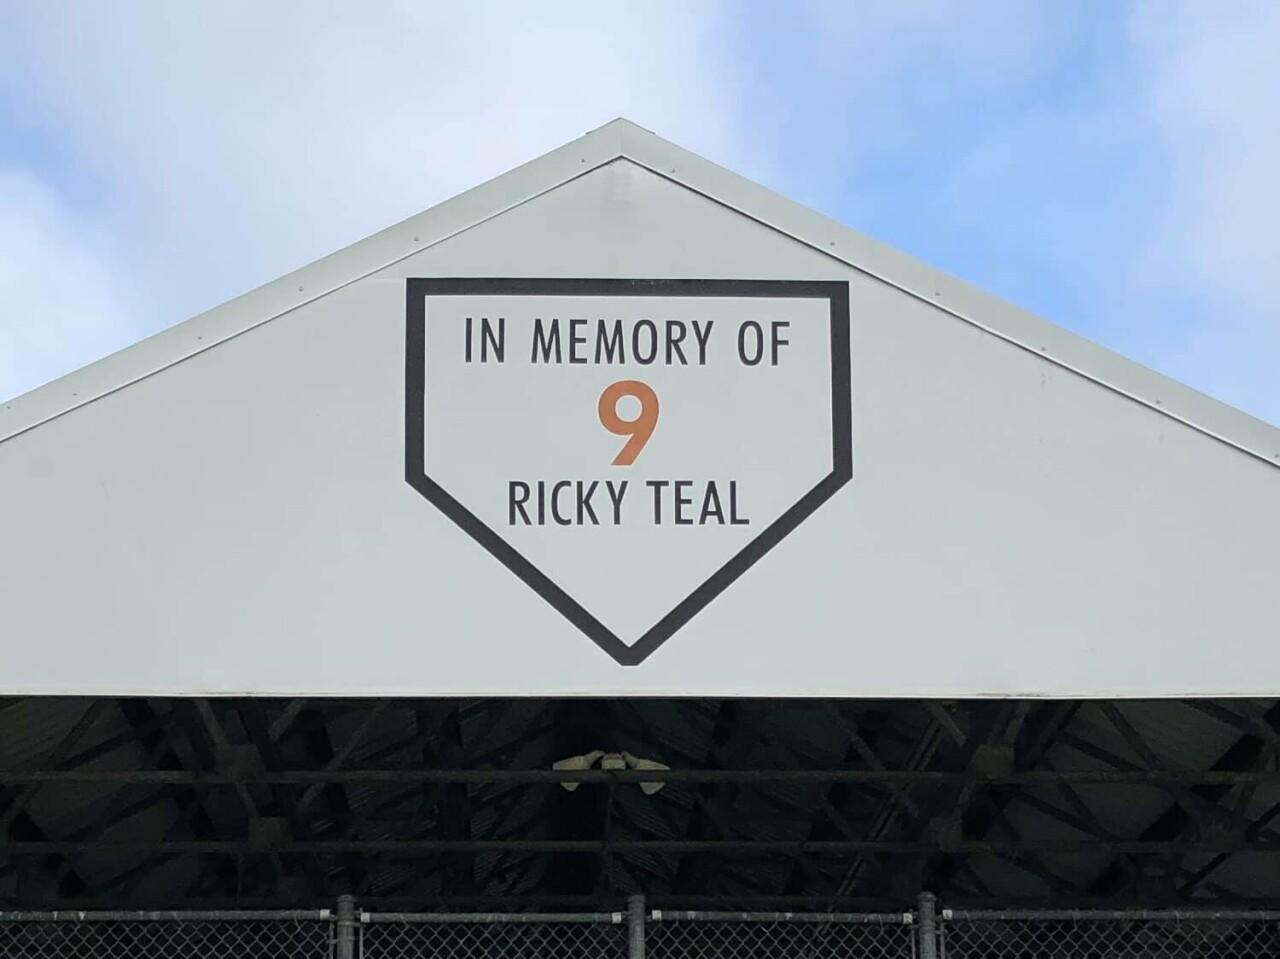 ricky teal memorial